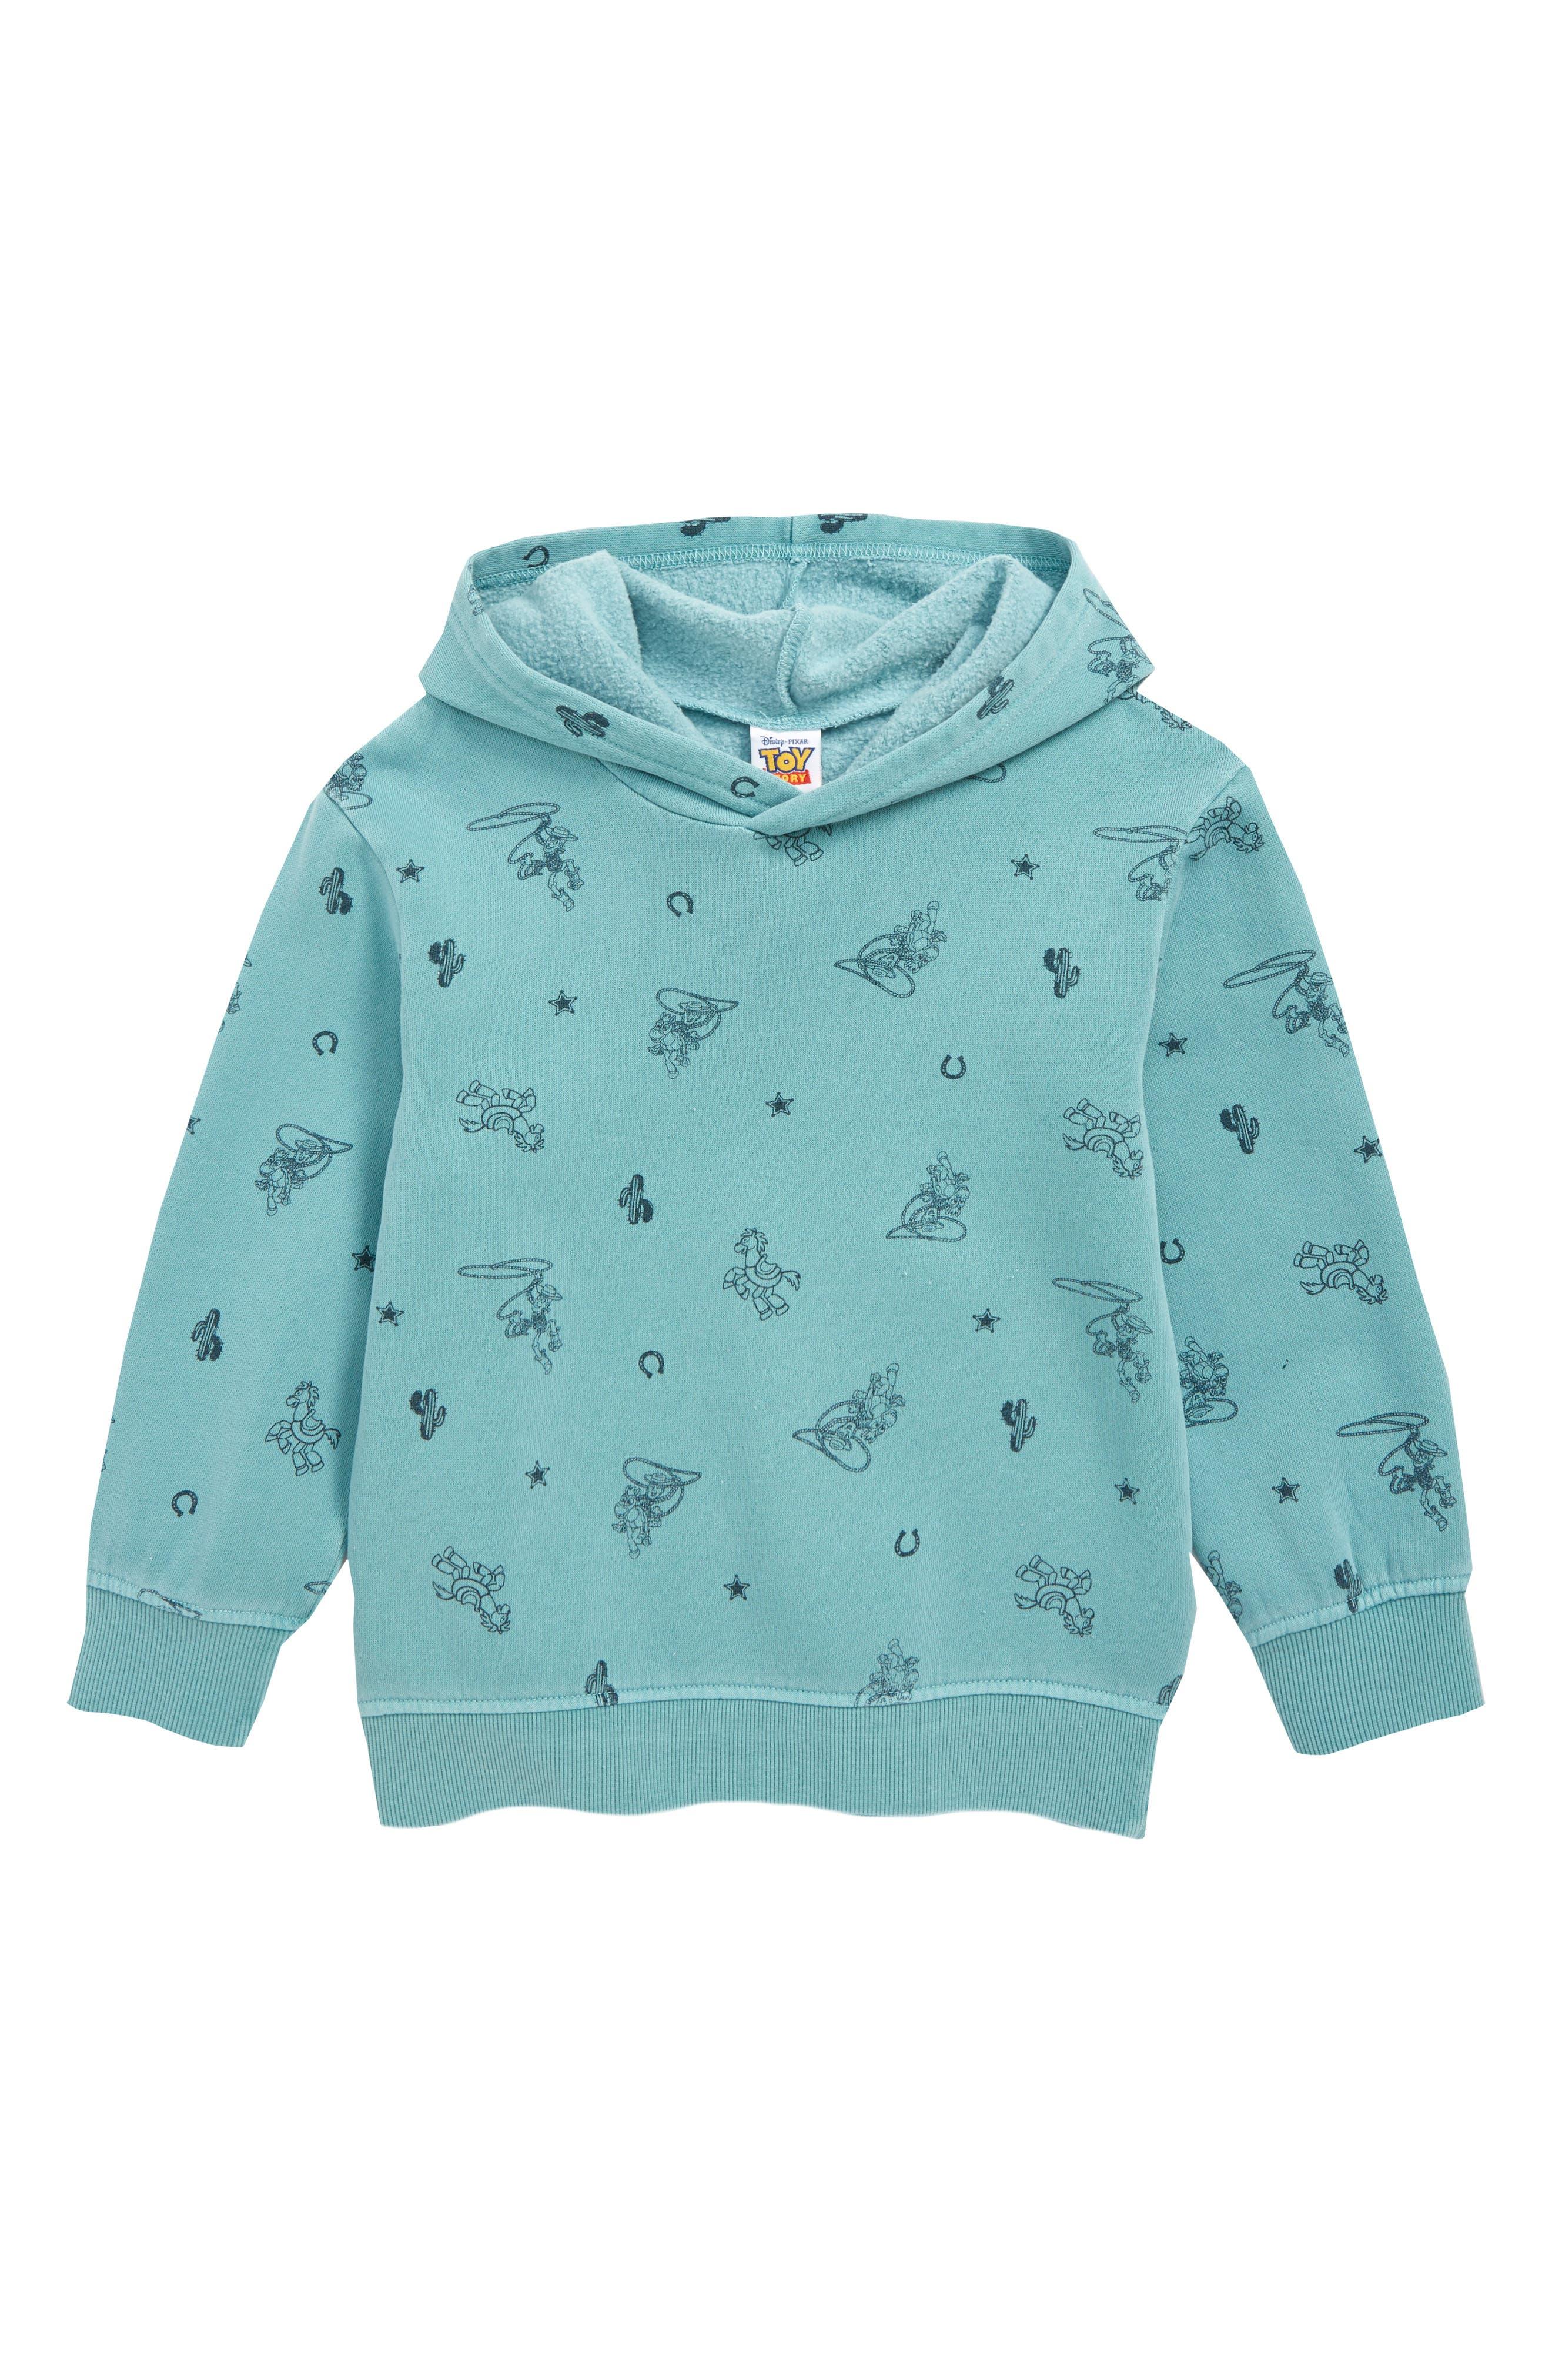 Boys Jem Woody  Bullseye Print Hooded Sweatshirt